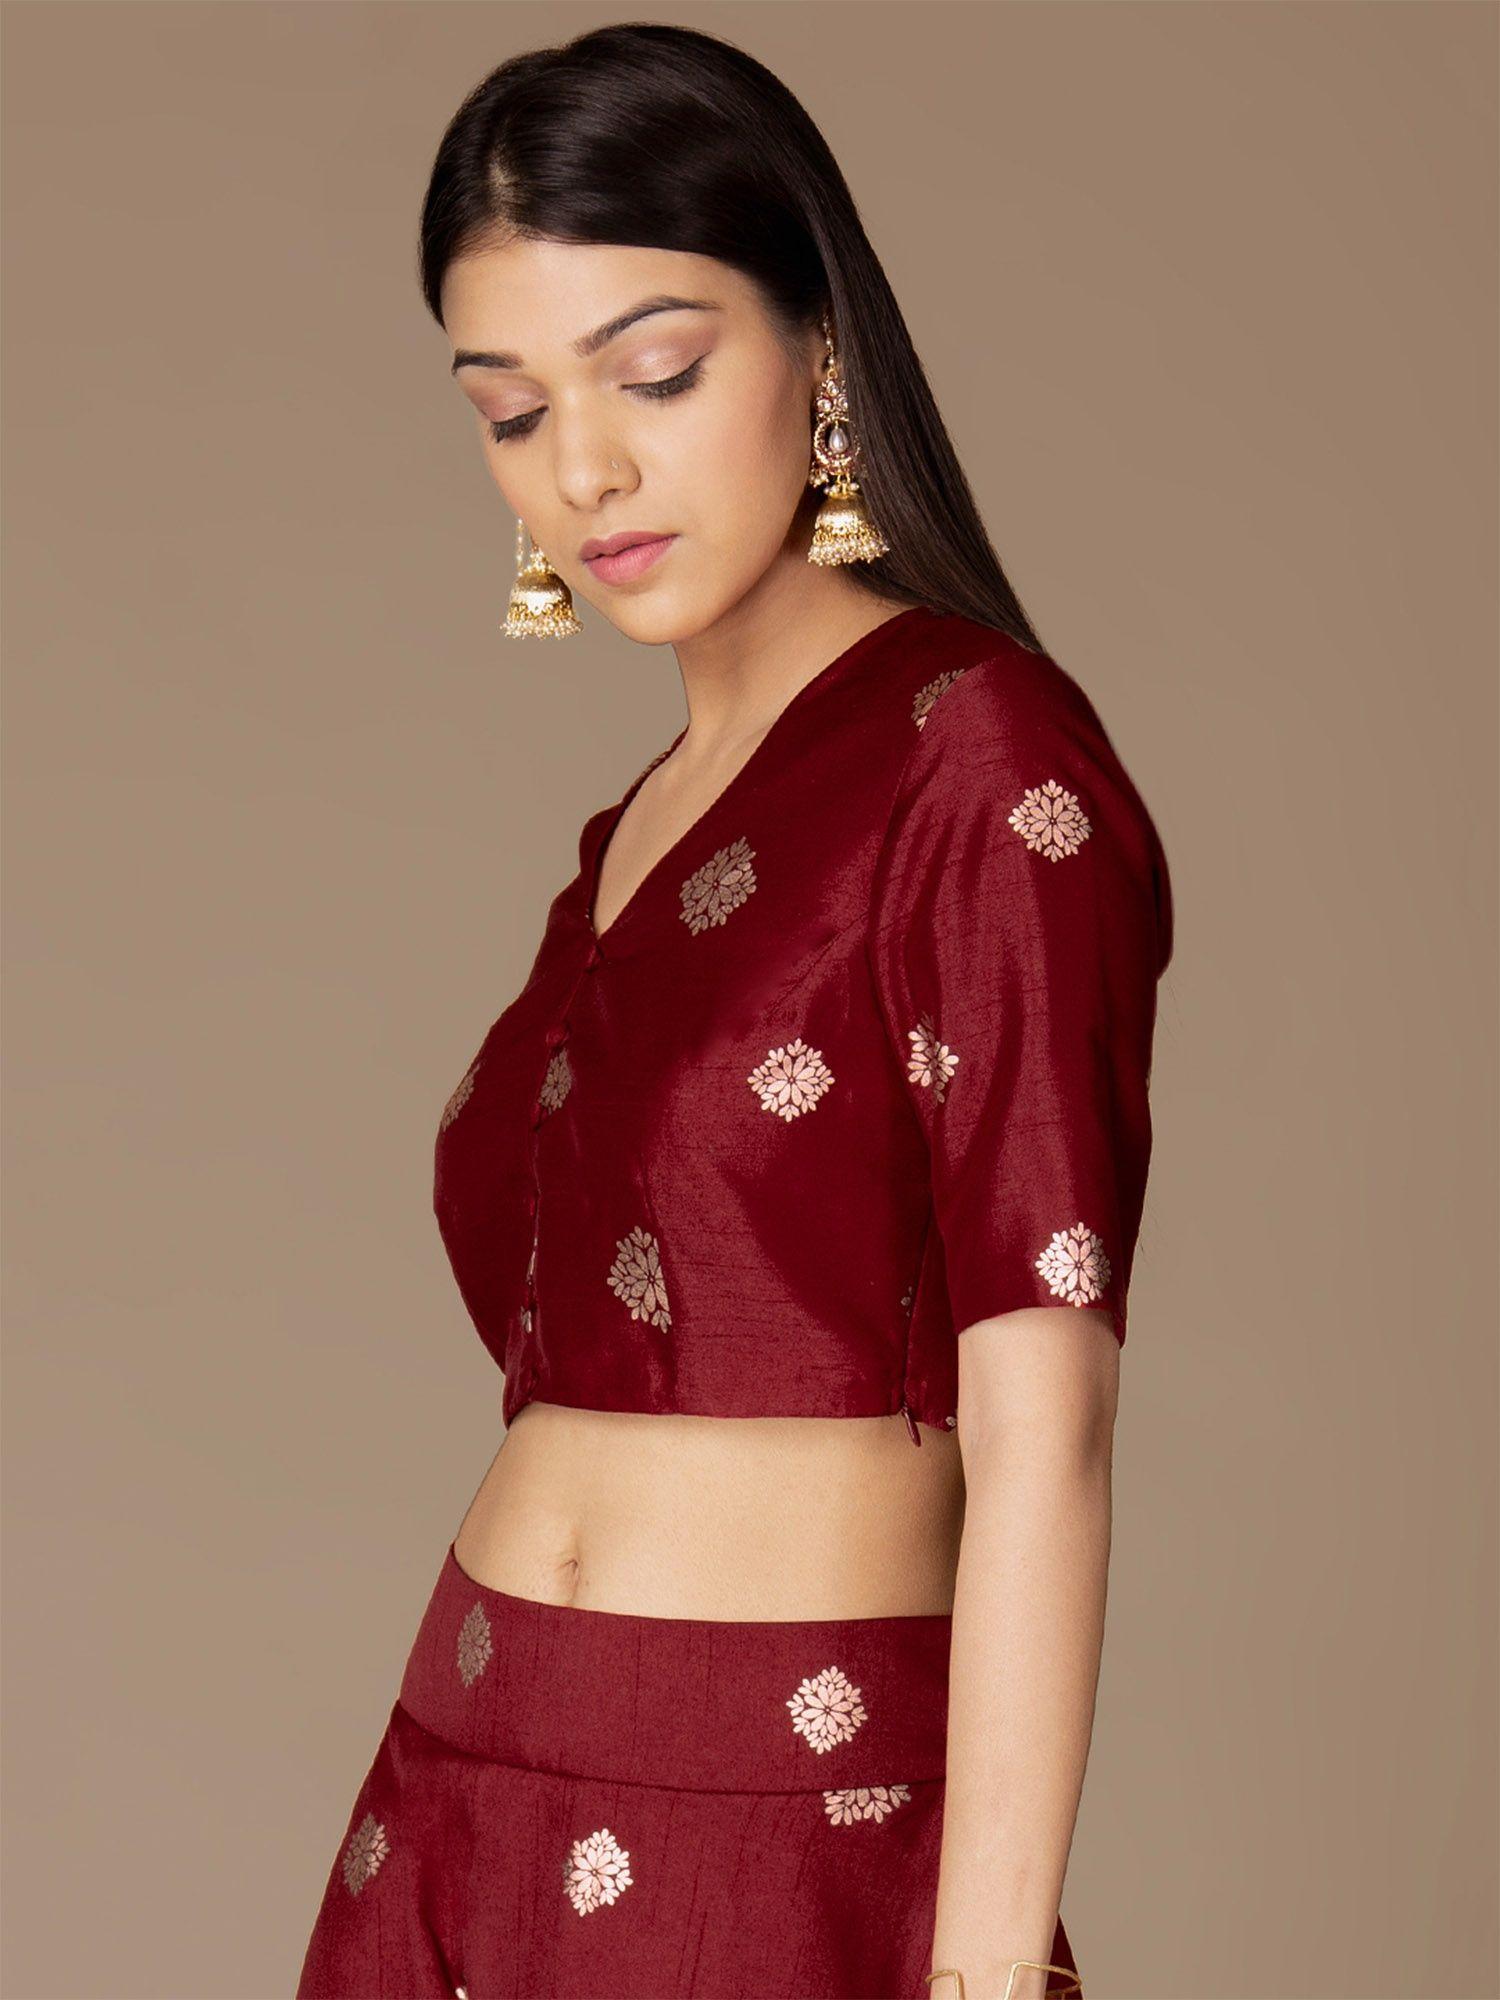 965b358015 Indya Shirts Tops and Crop Tops : Buy Indya Maroon Rose Gold Foil ...